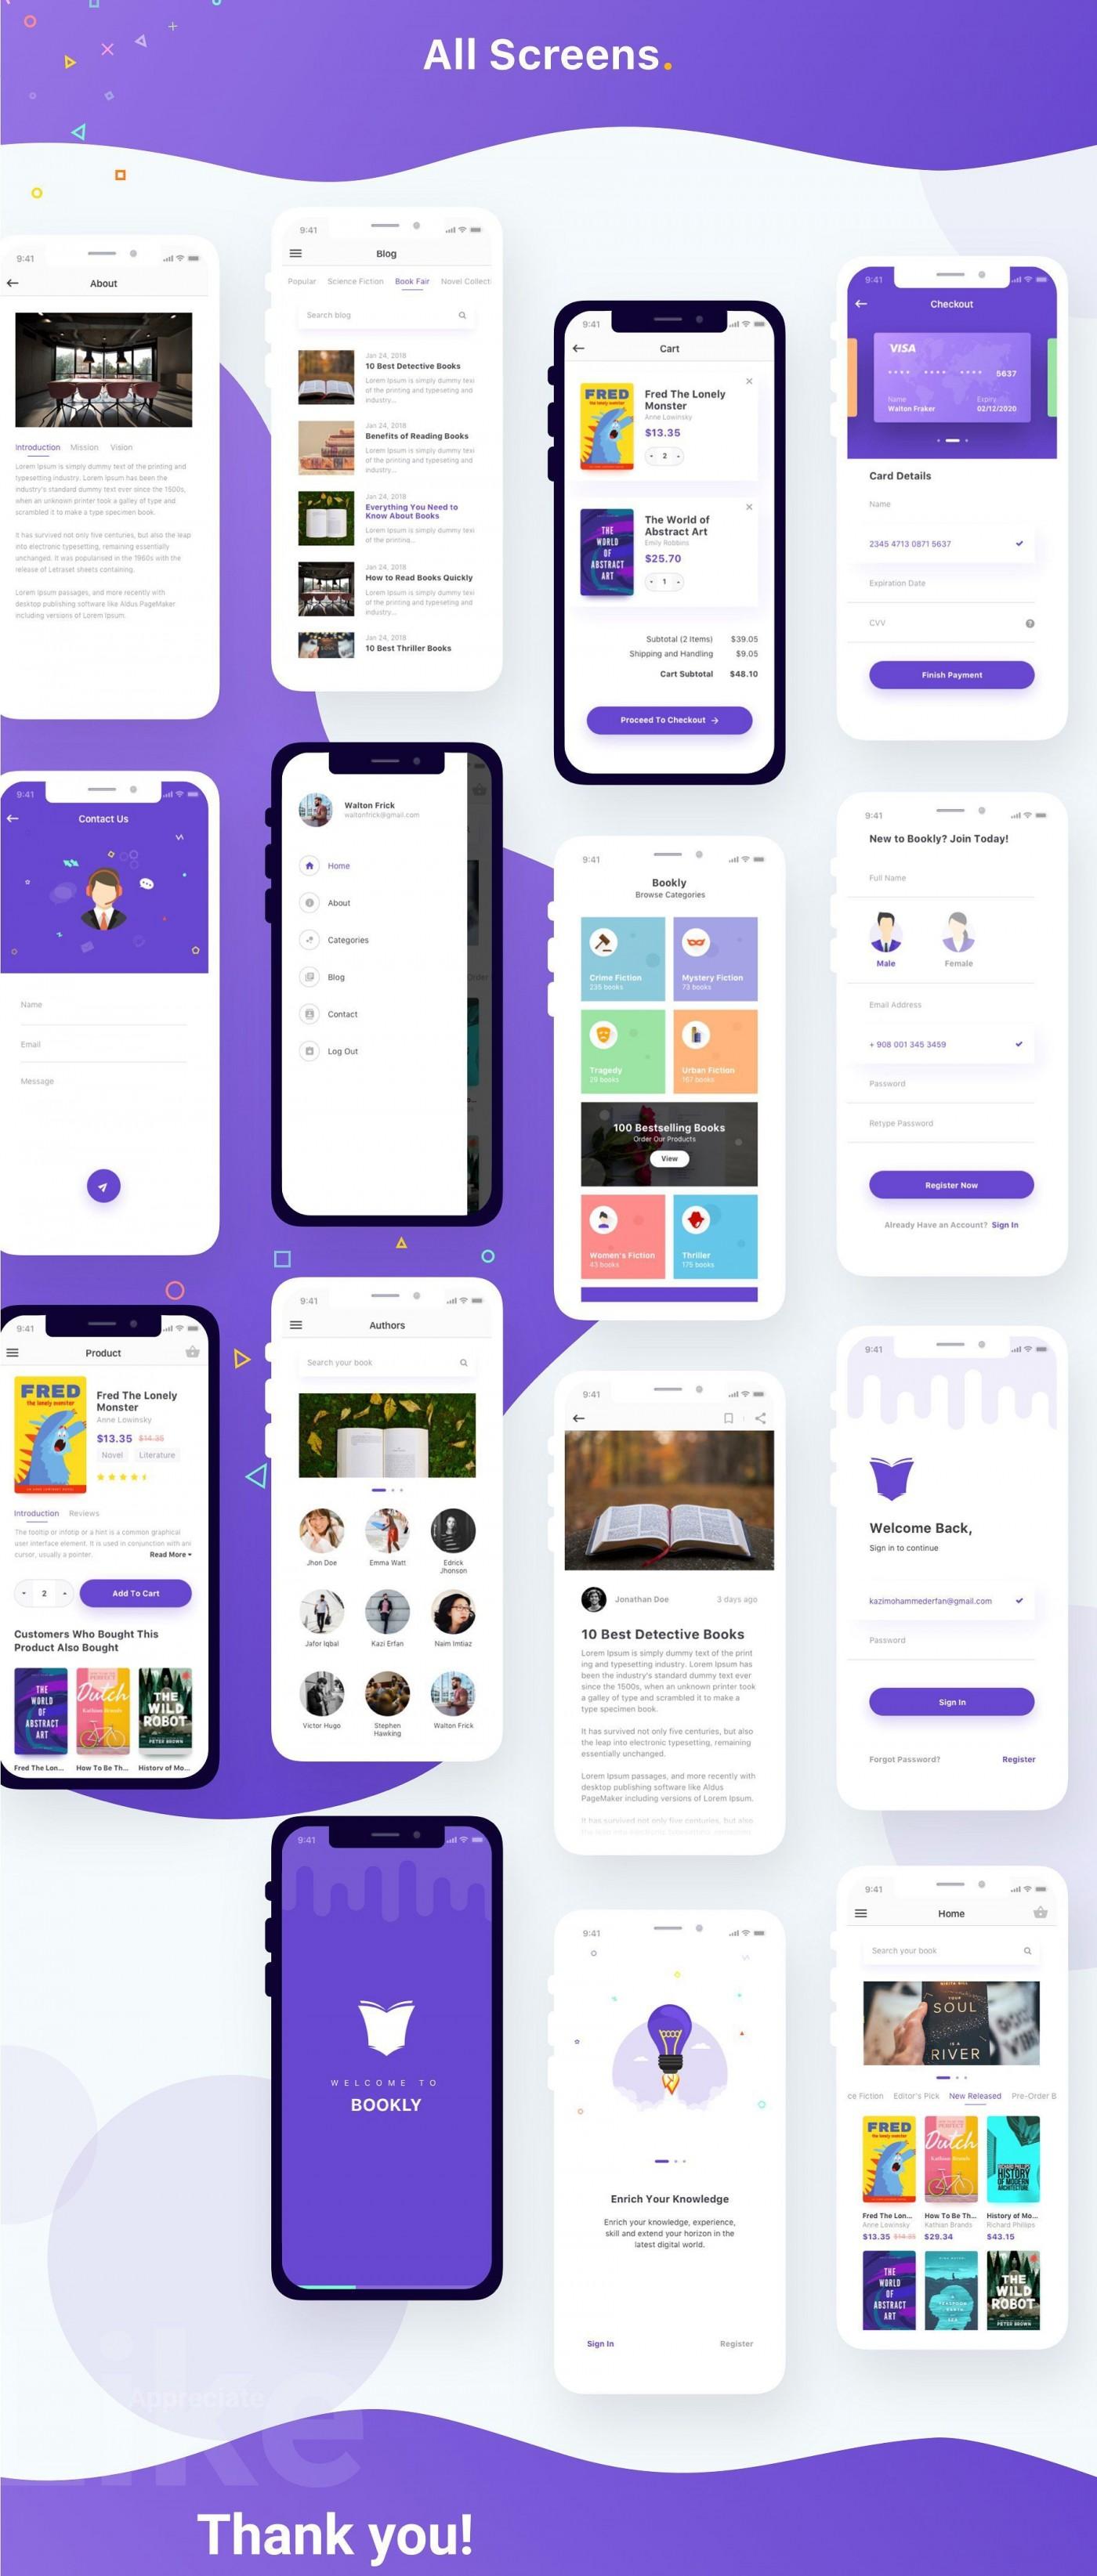 001 Fantastic Iphone App Design Template High Def  X Io Sketch1400